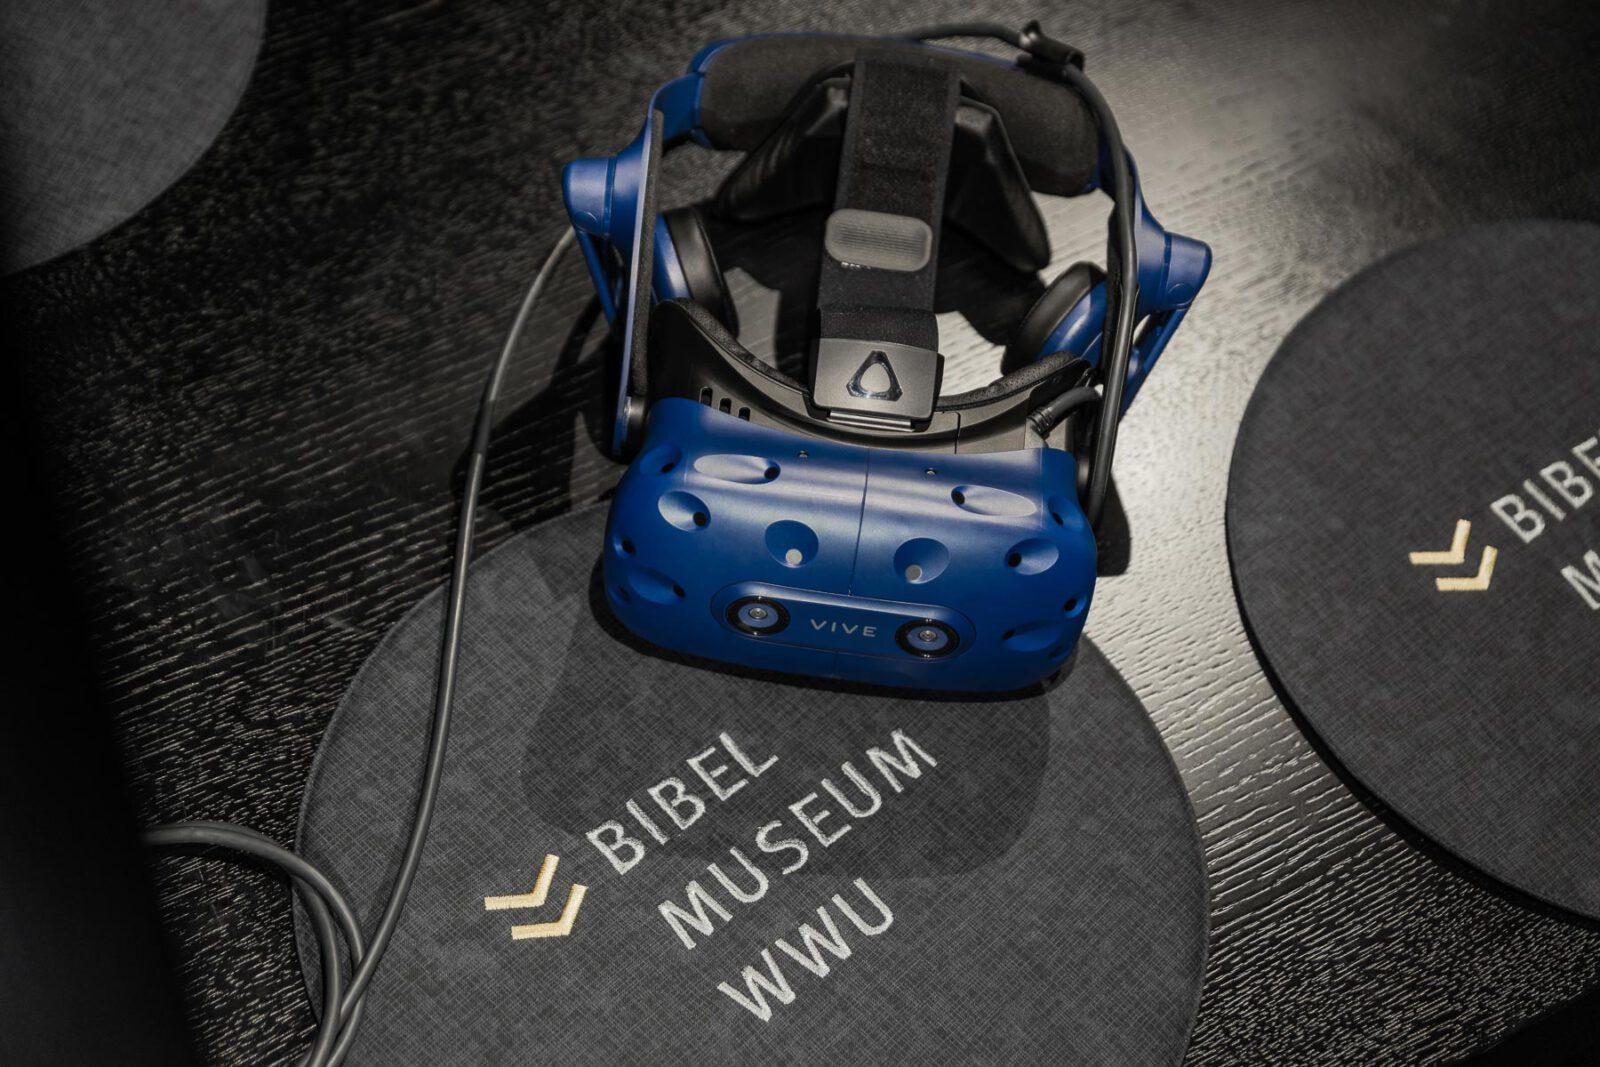 3_S_Bok_Bibelmuseum_23-01-2020_TE_5590